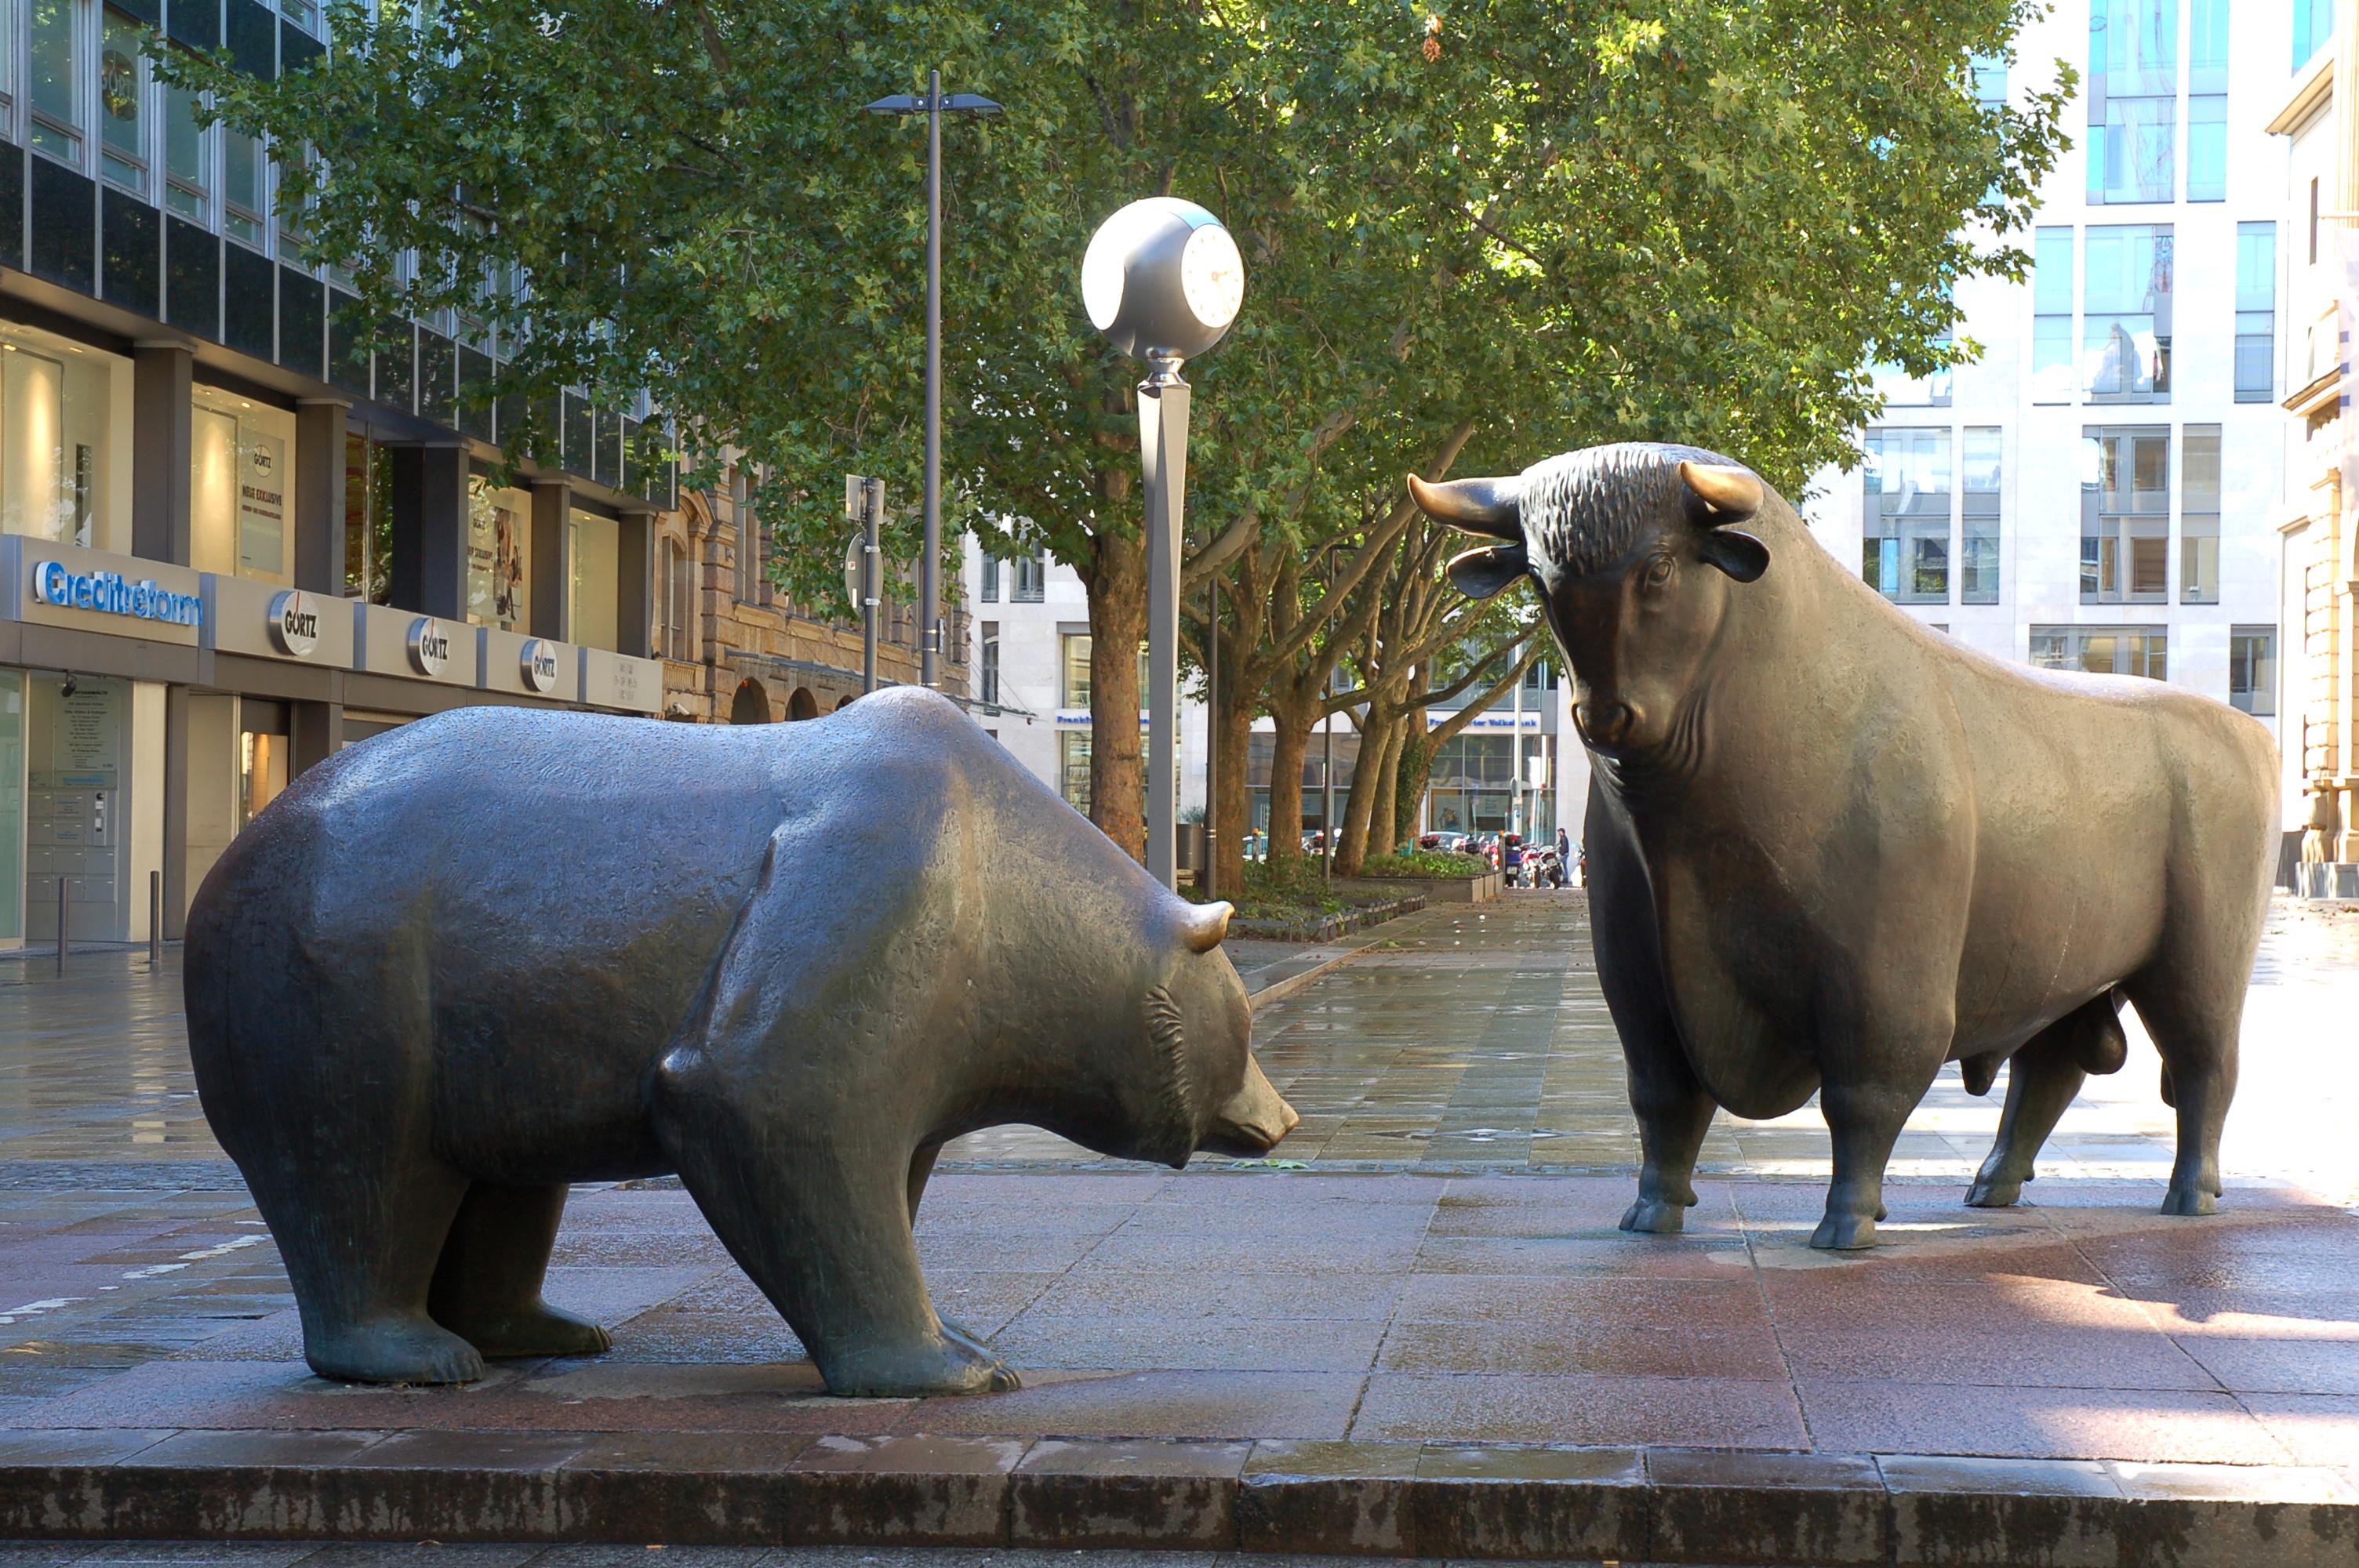 The Bull Keeps Running: Q2 Market Update